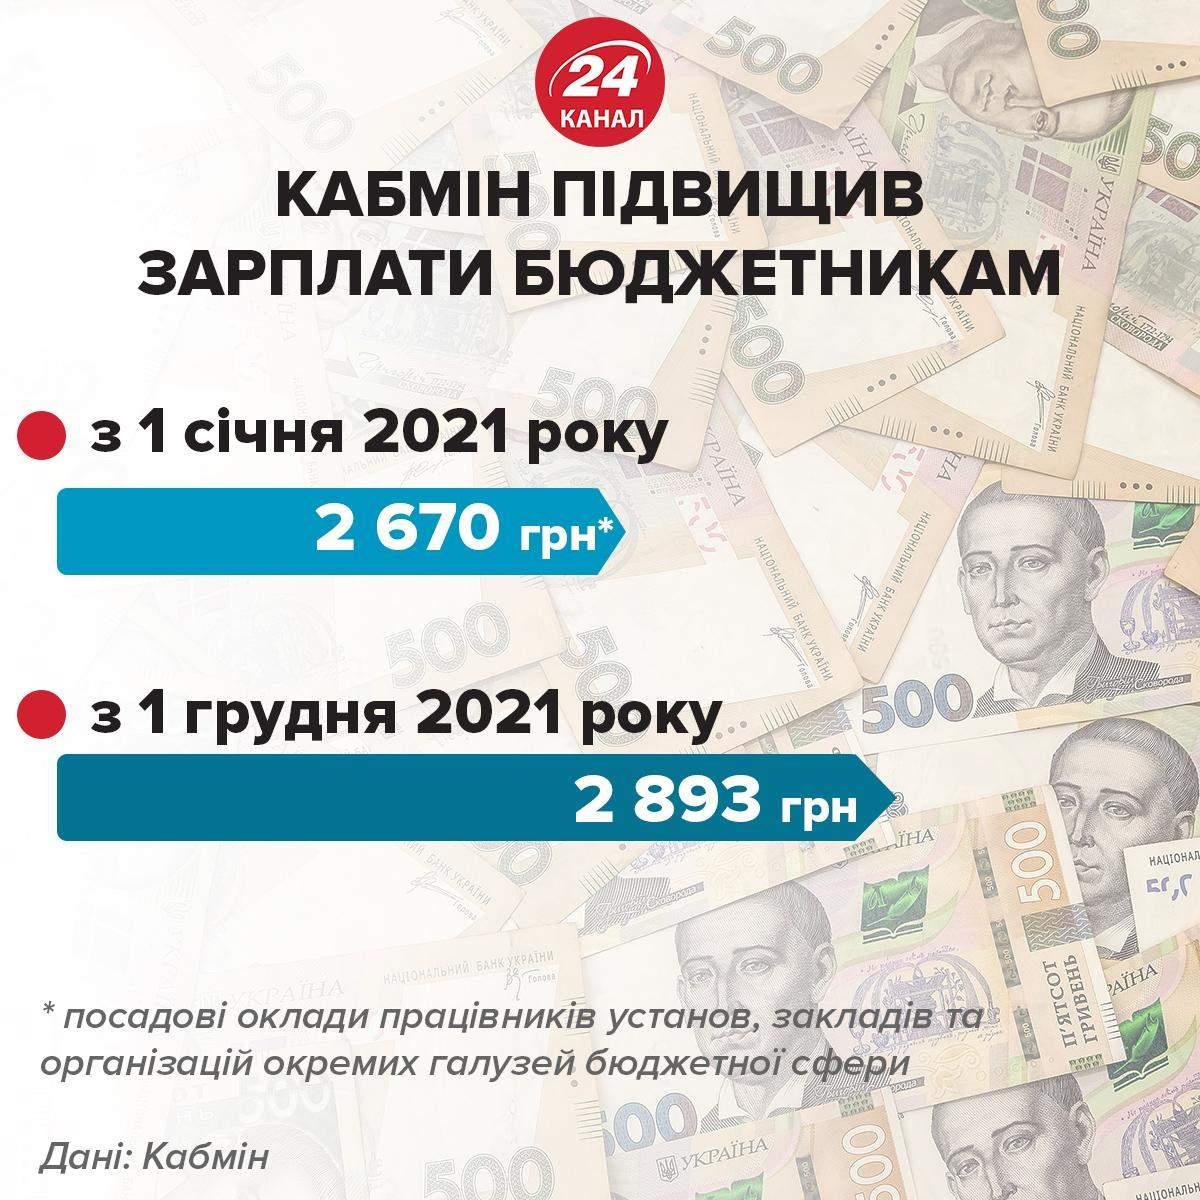 Кабмин повысил зарплаты бюджетникам Инфографика 24 канала